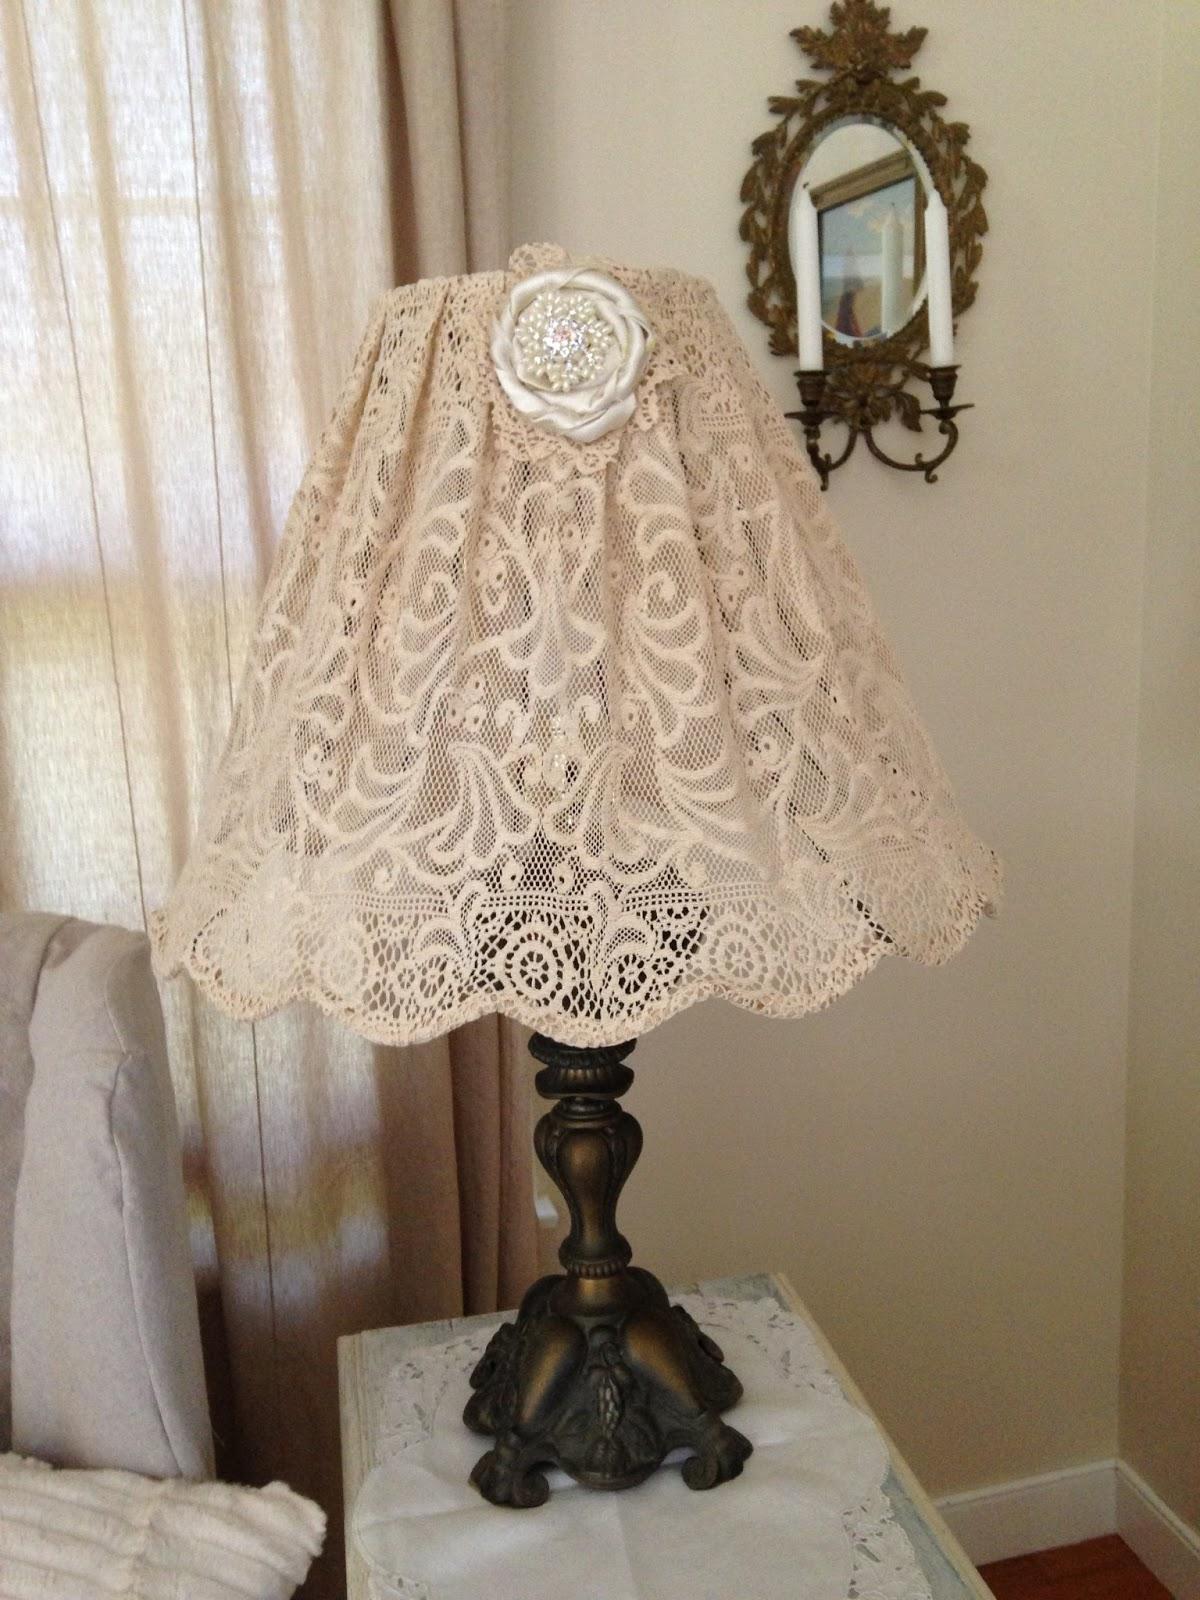 Restored Treasures Too: DIY lampshade using an antique ...